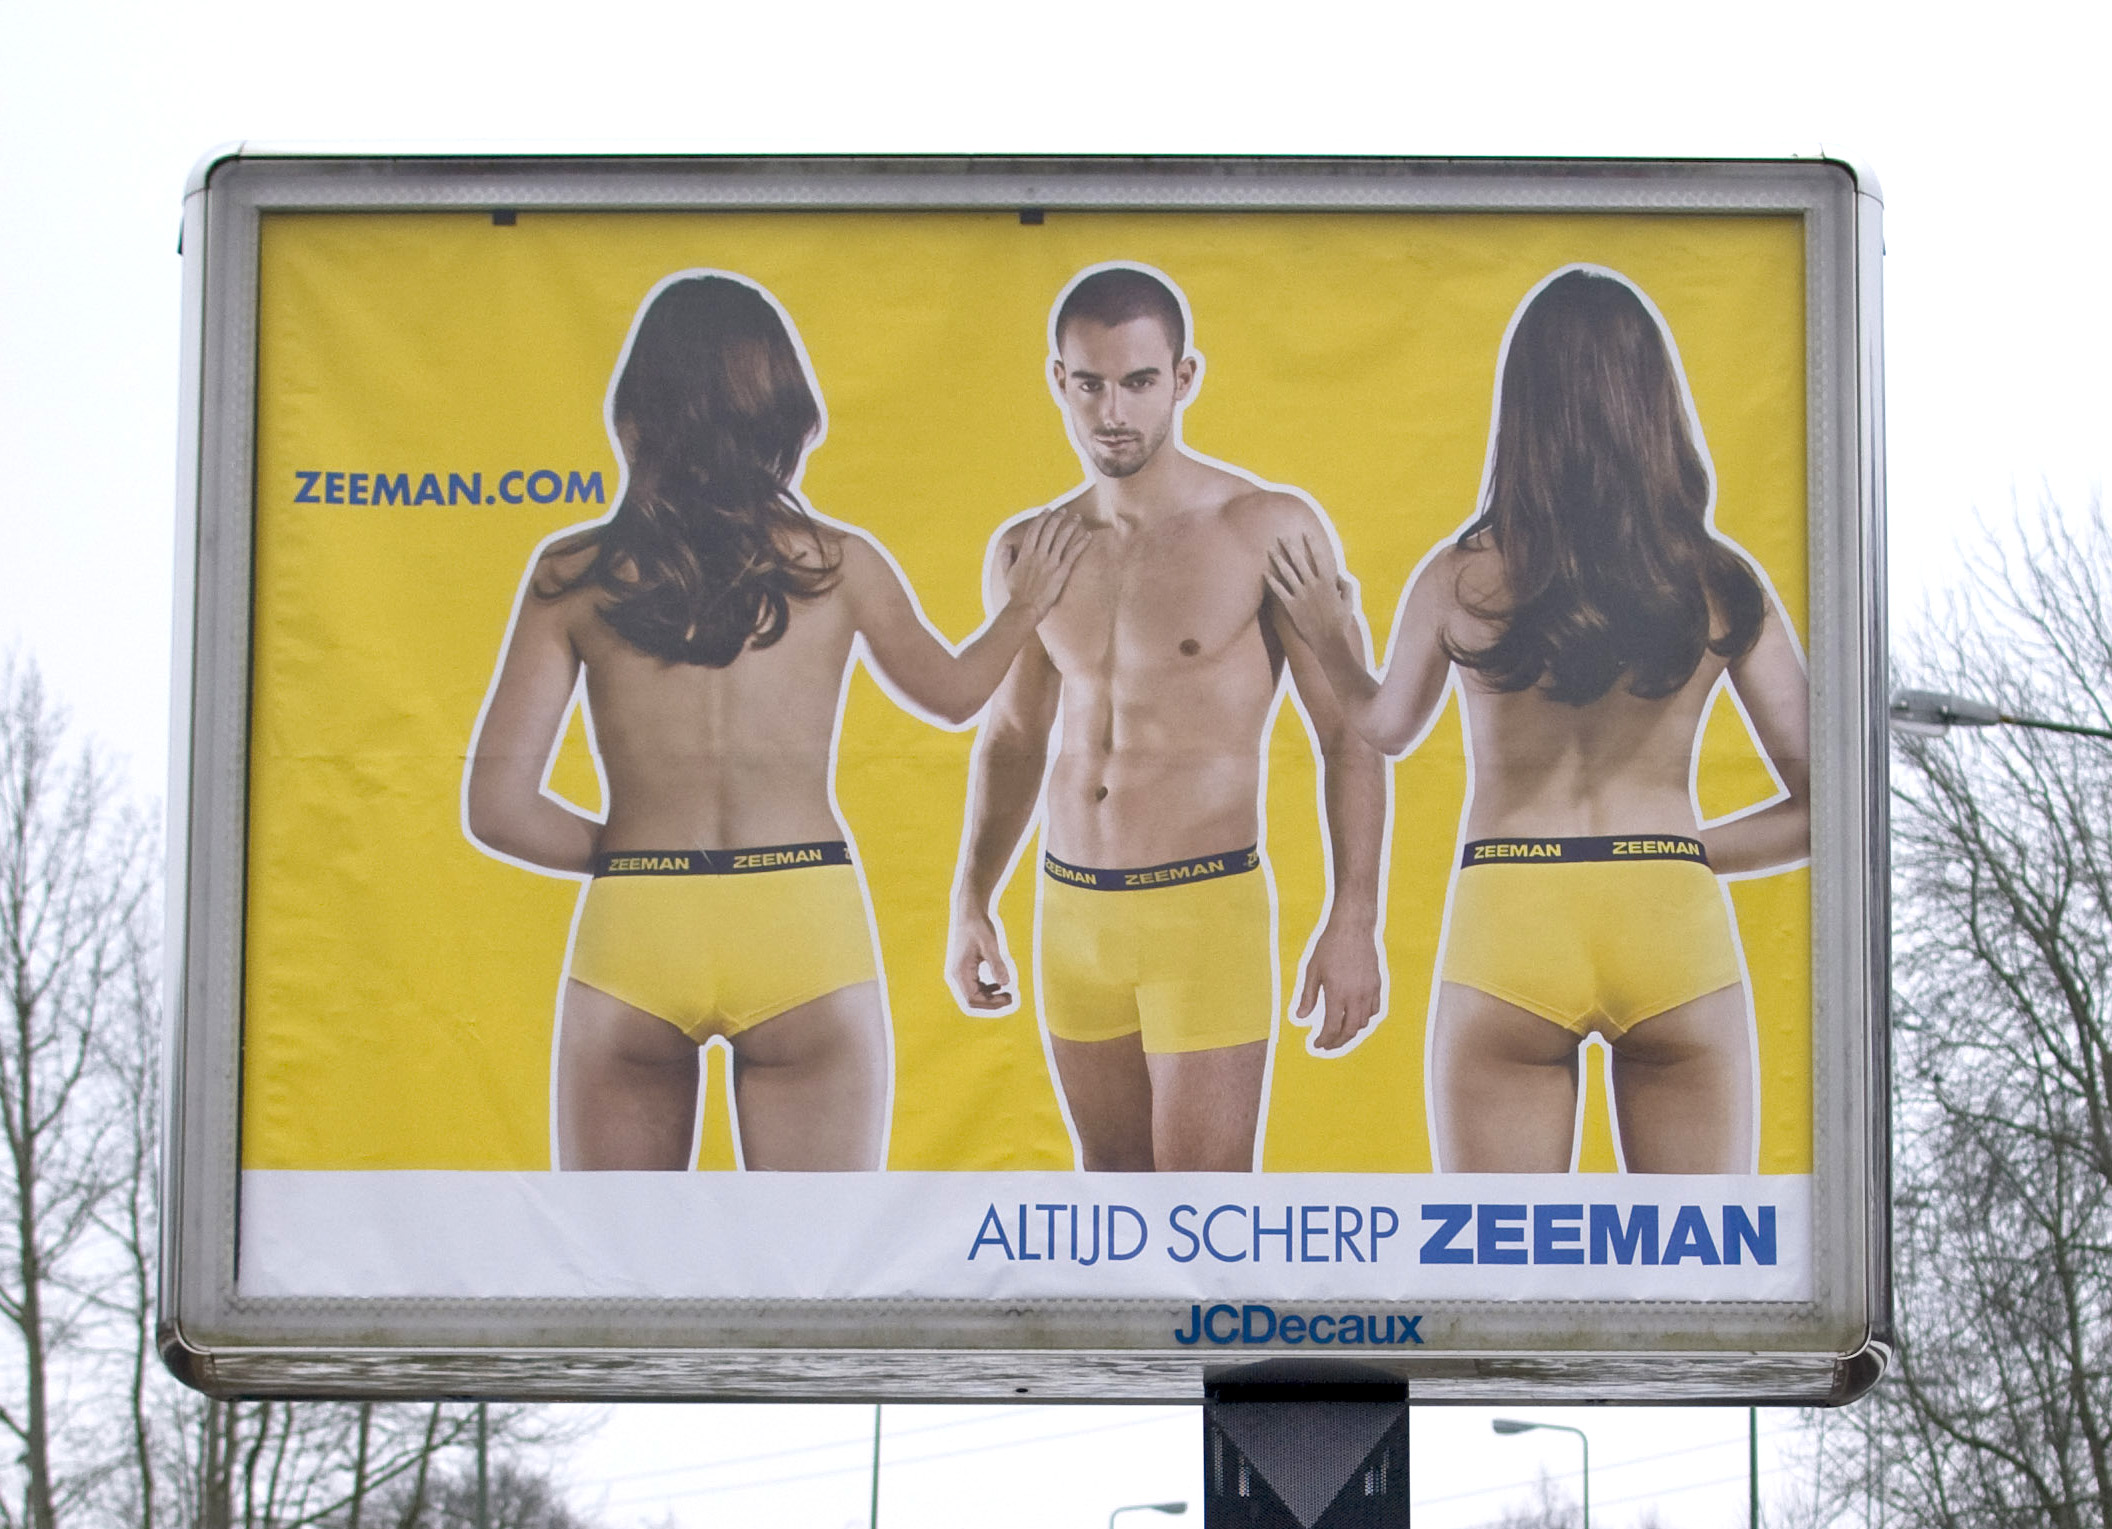 hipster-billboard1